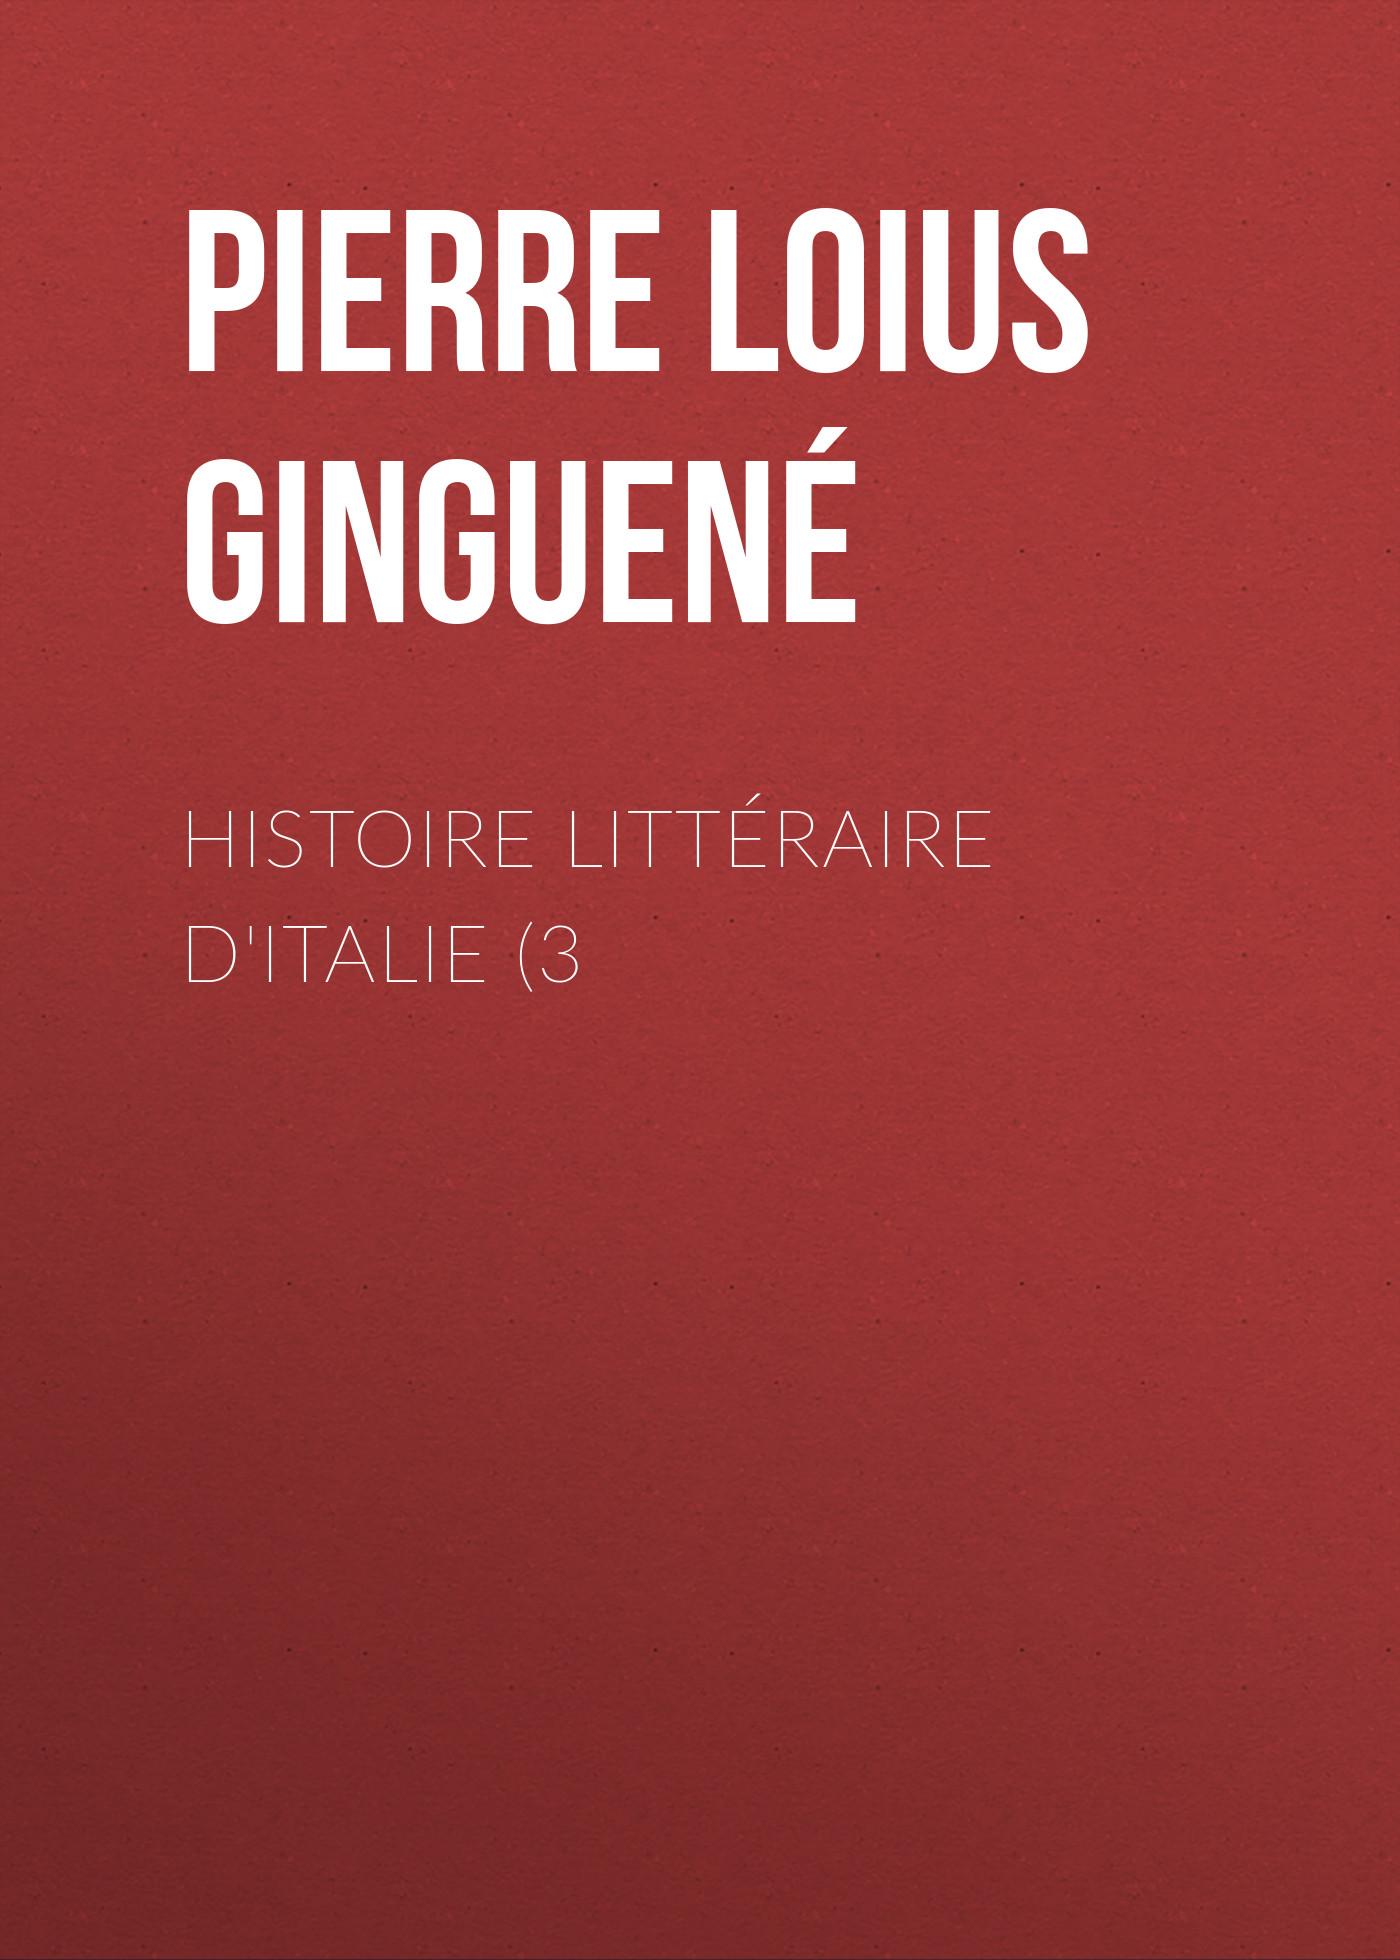 все цены на Pierre Loius Ginguené Histoire littéraire d'Italie (3 онлайн